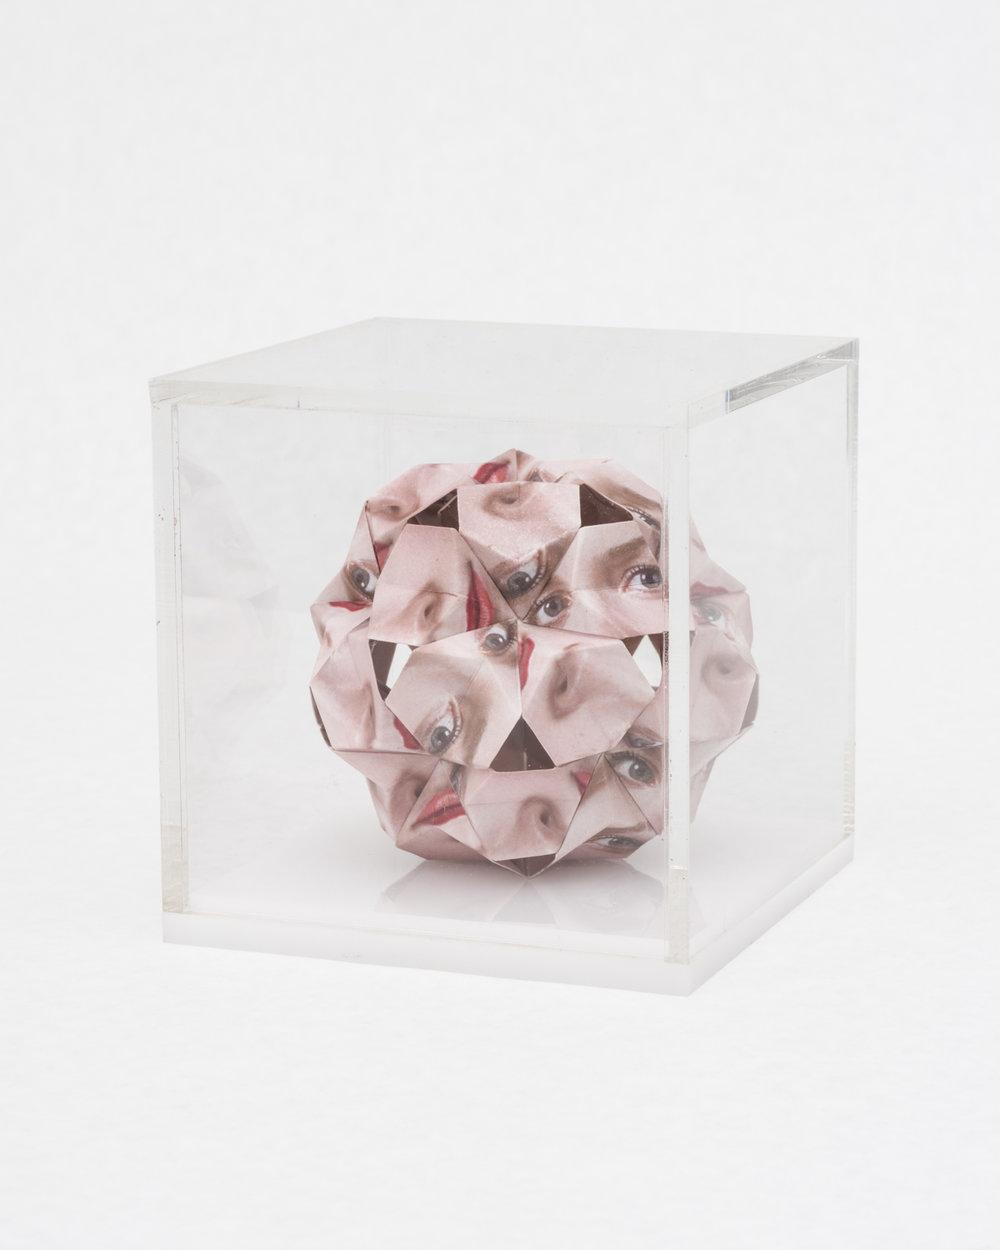 Alma Haser,  Prototype No. 32 (Jessica) , 2016  Digital pigment print with folded digital pigment print sculpture, plexiglass box, 12 x 12 x 12 cm (approx. 5 x 5 x 5 in), edition of 5   Inquire